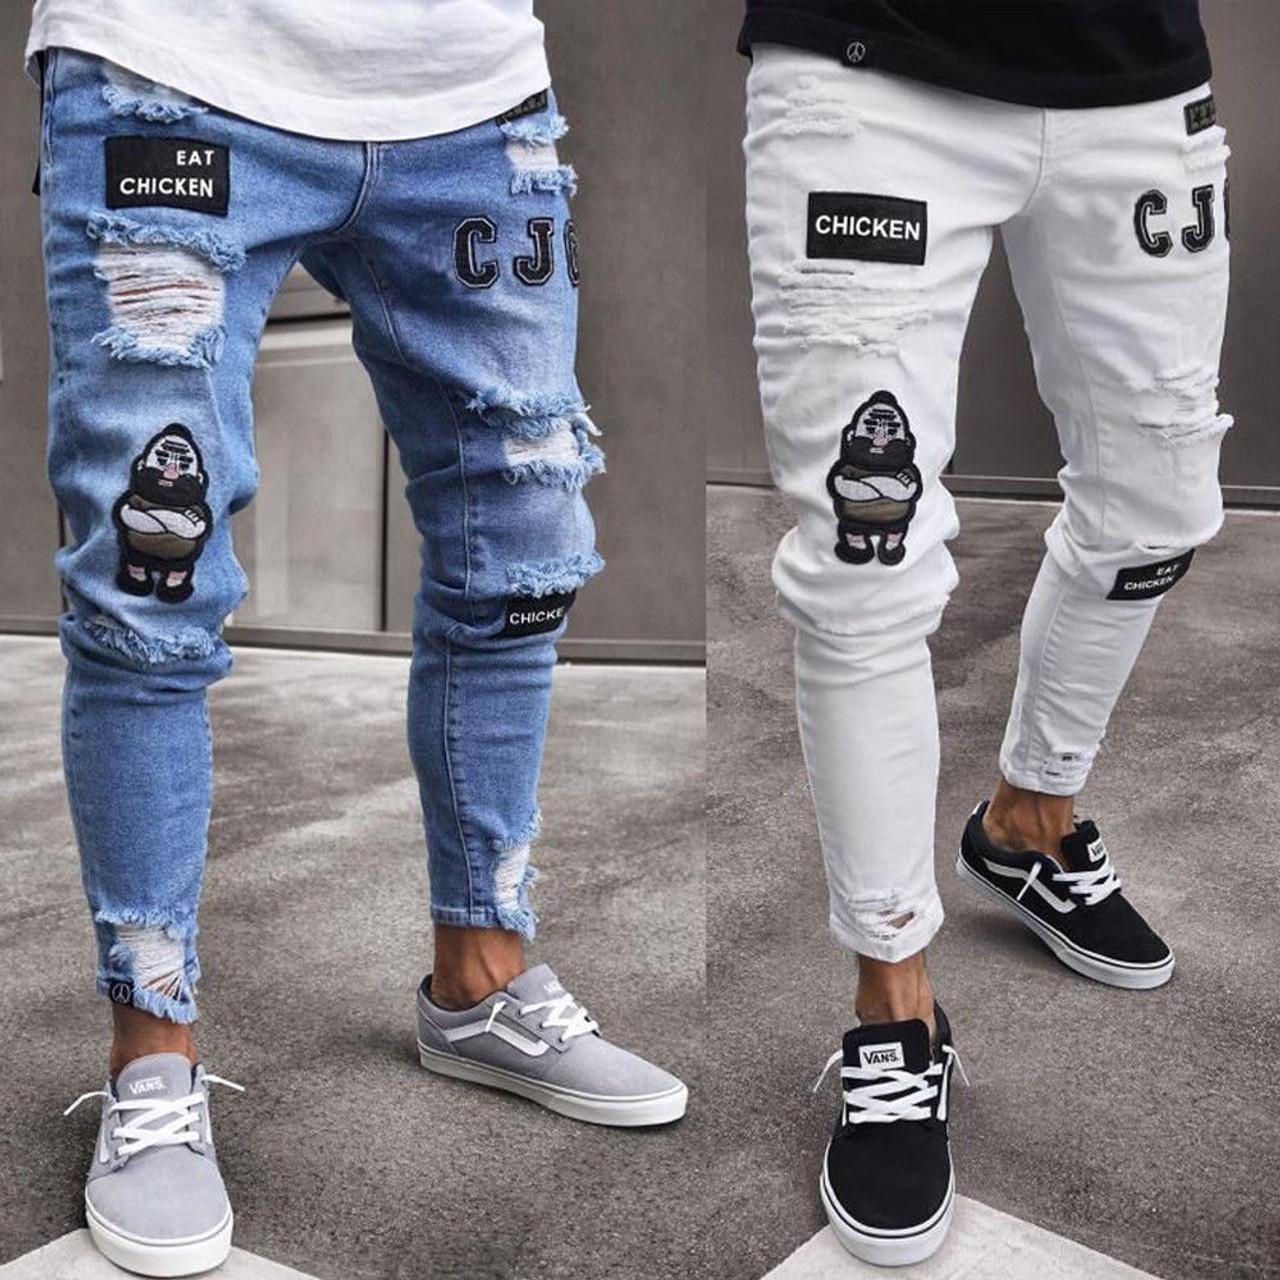 34722082005 Hirigin 2018 Jeans Men Fear Of Gold Skinny Jeans Fashion Biker Steetwear Distressed  Ripped Denim Pencil ...